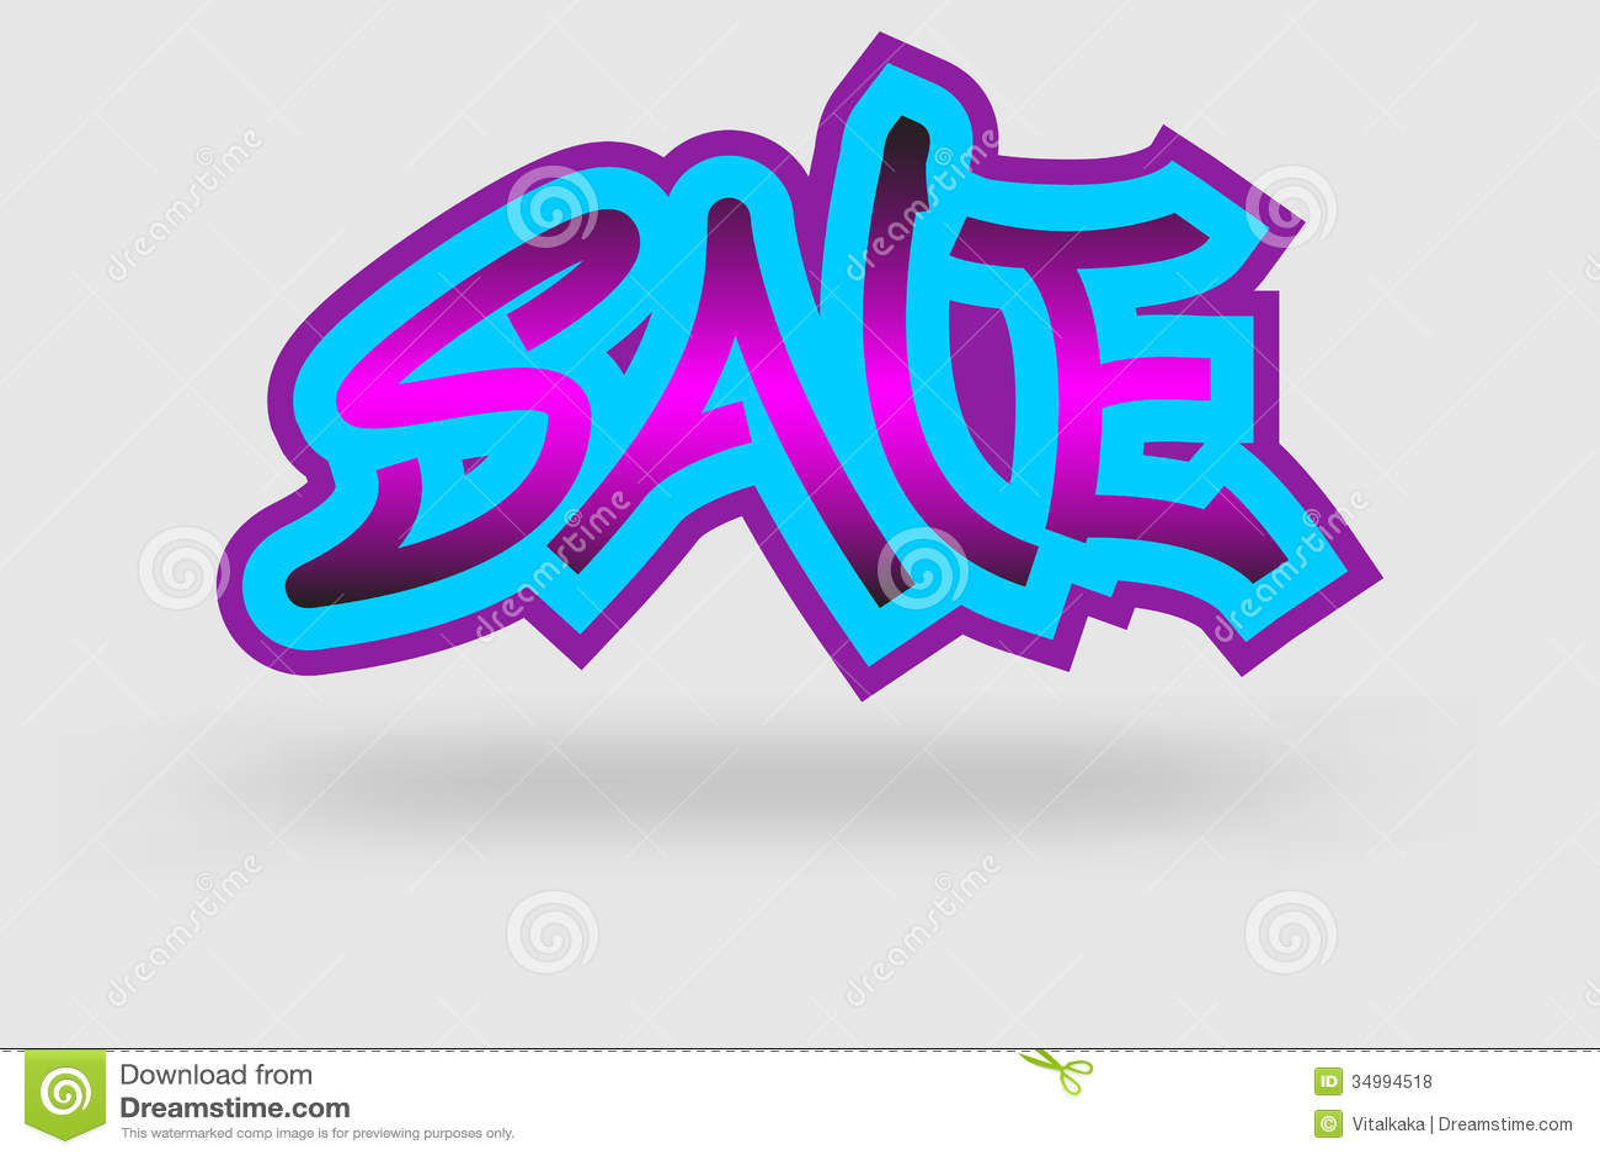 Sale Graffiti Royalty Free Stock Photos - Image: 34994518